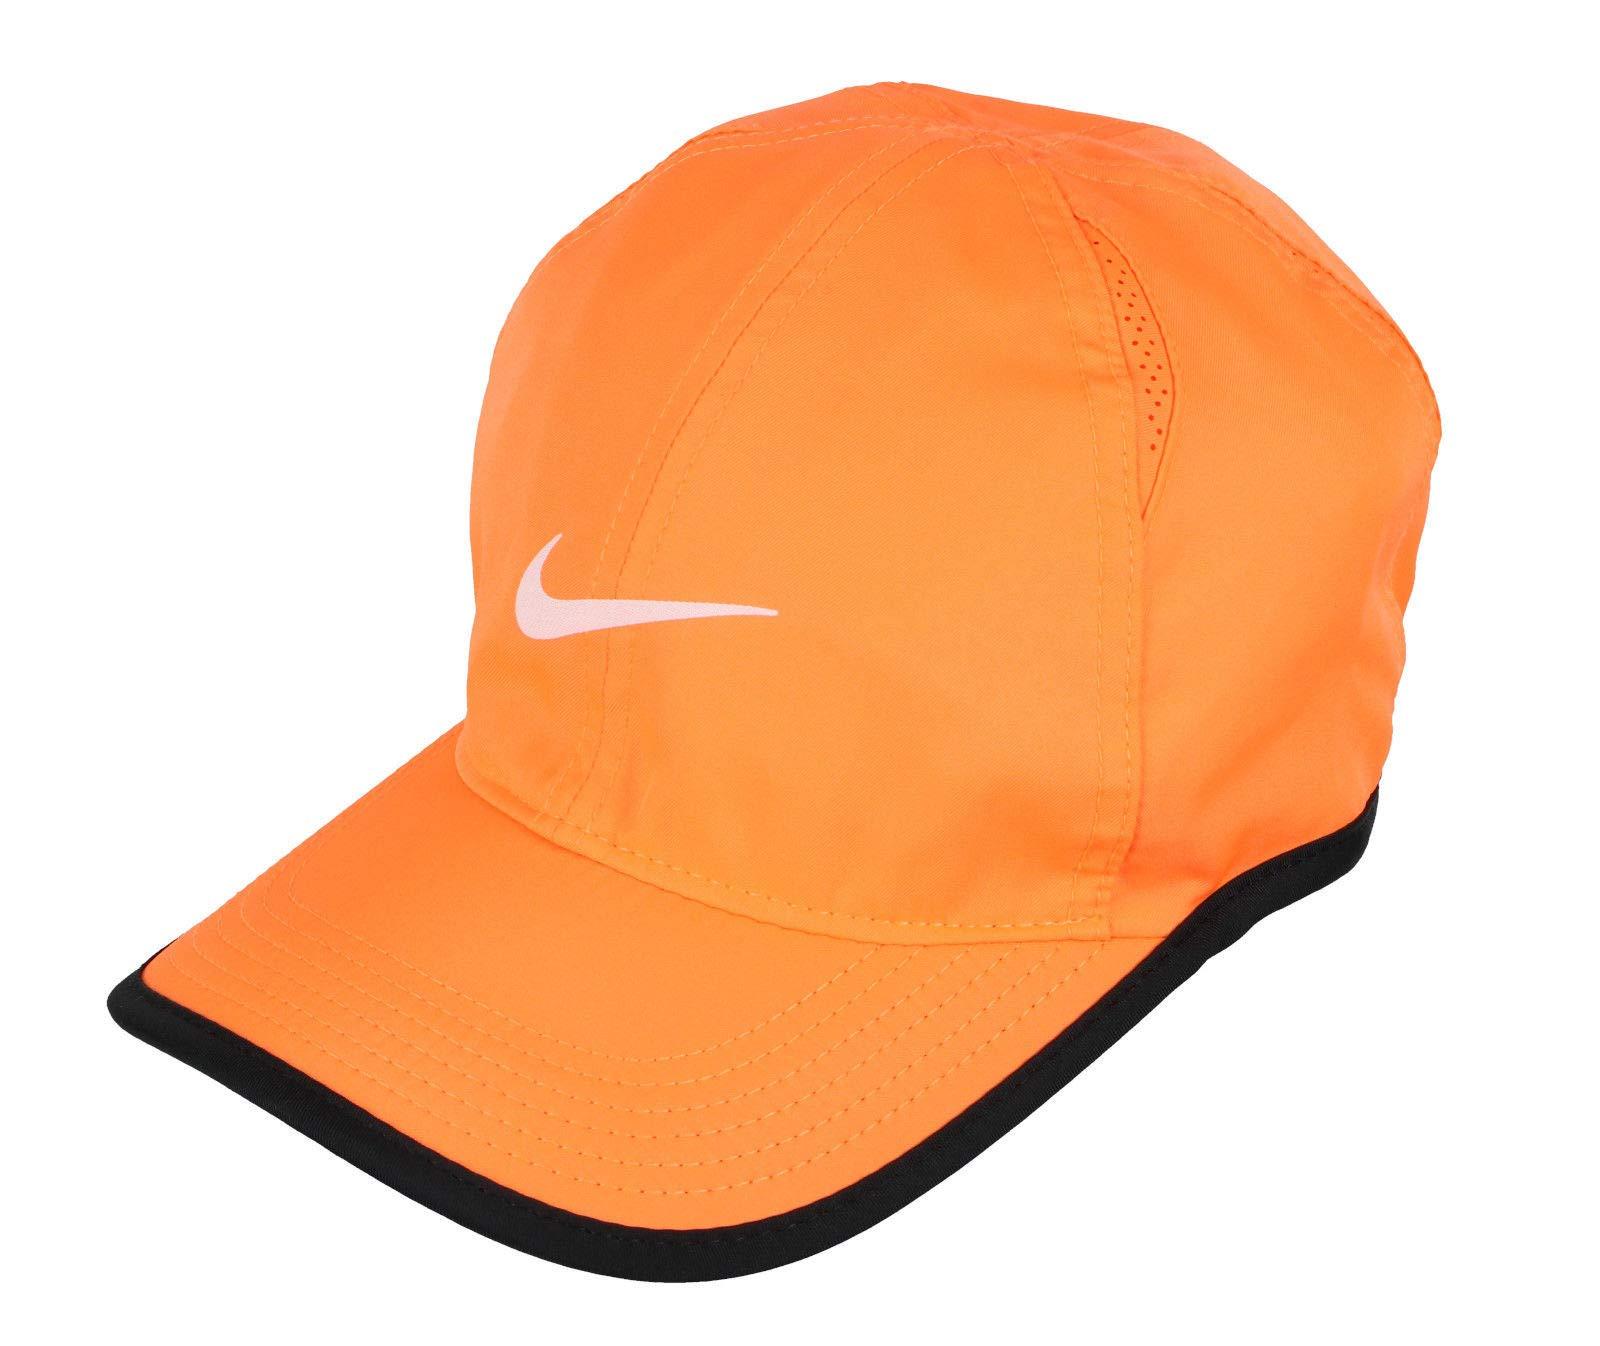 Nike Feather Light Tennis Hat (Tart/Black/Black/White, One Size)